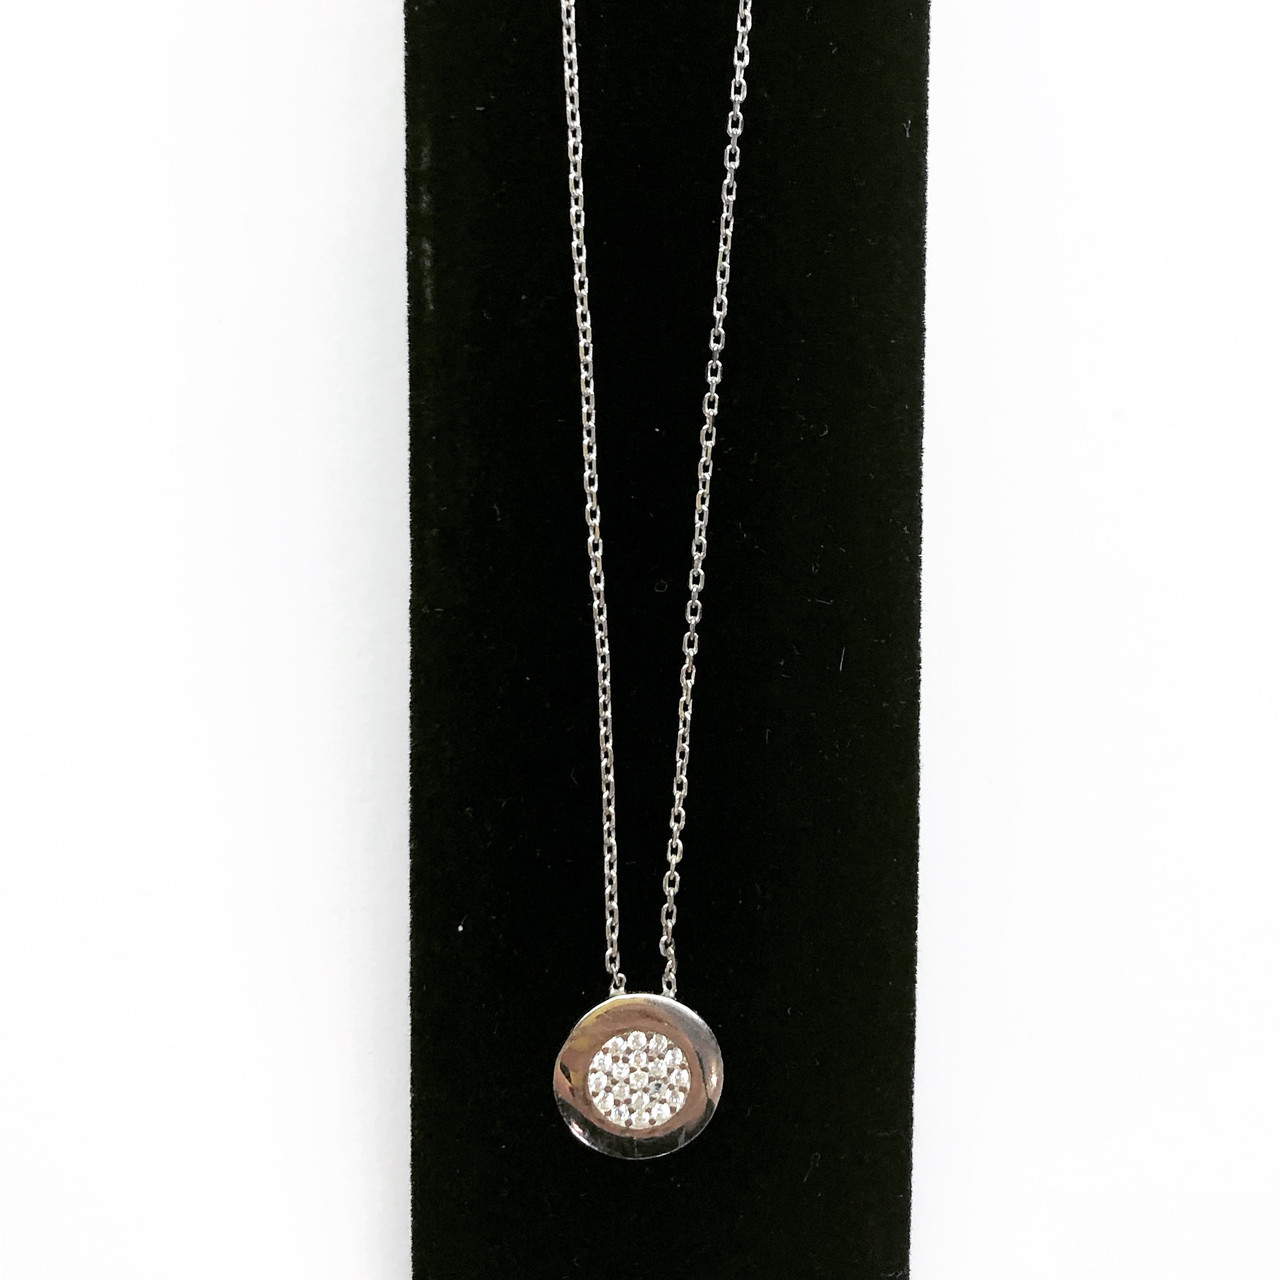 Кулон из серебра в стиле Cartier